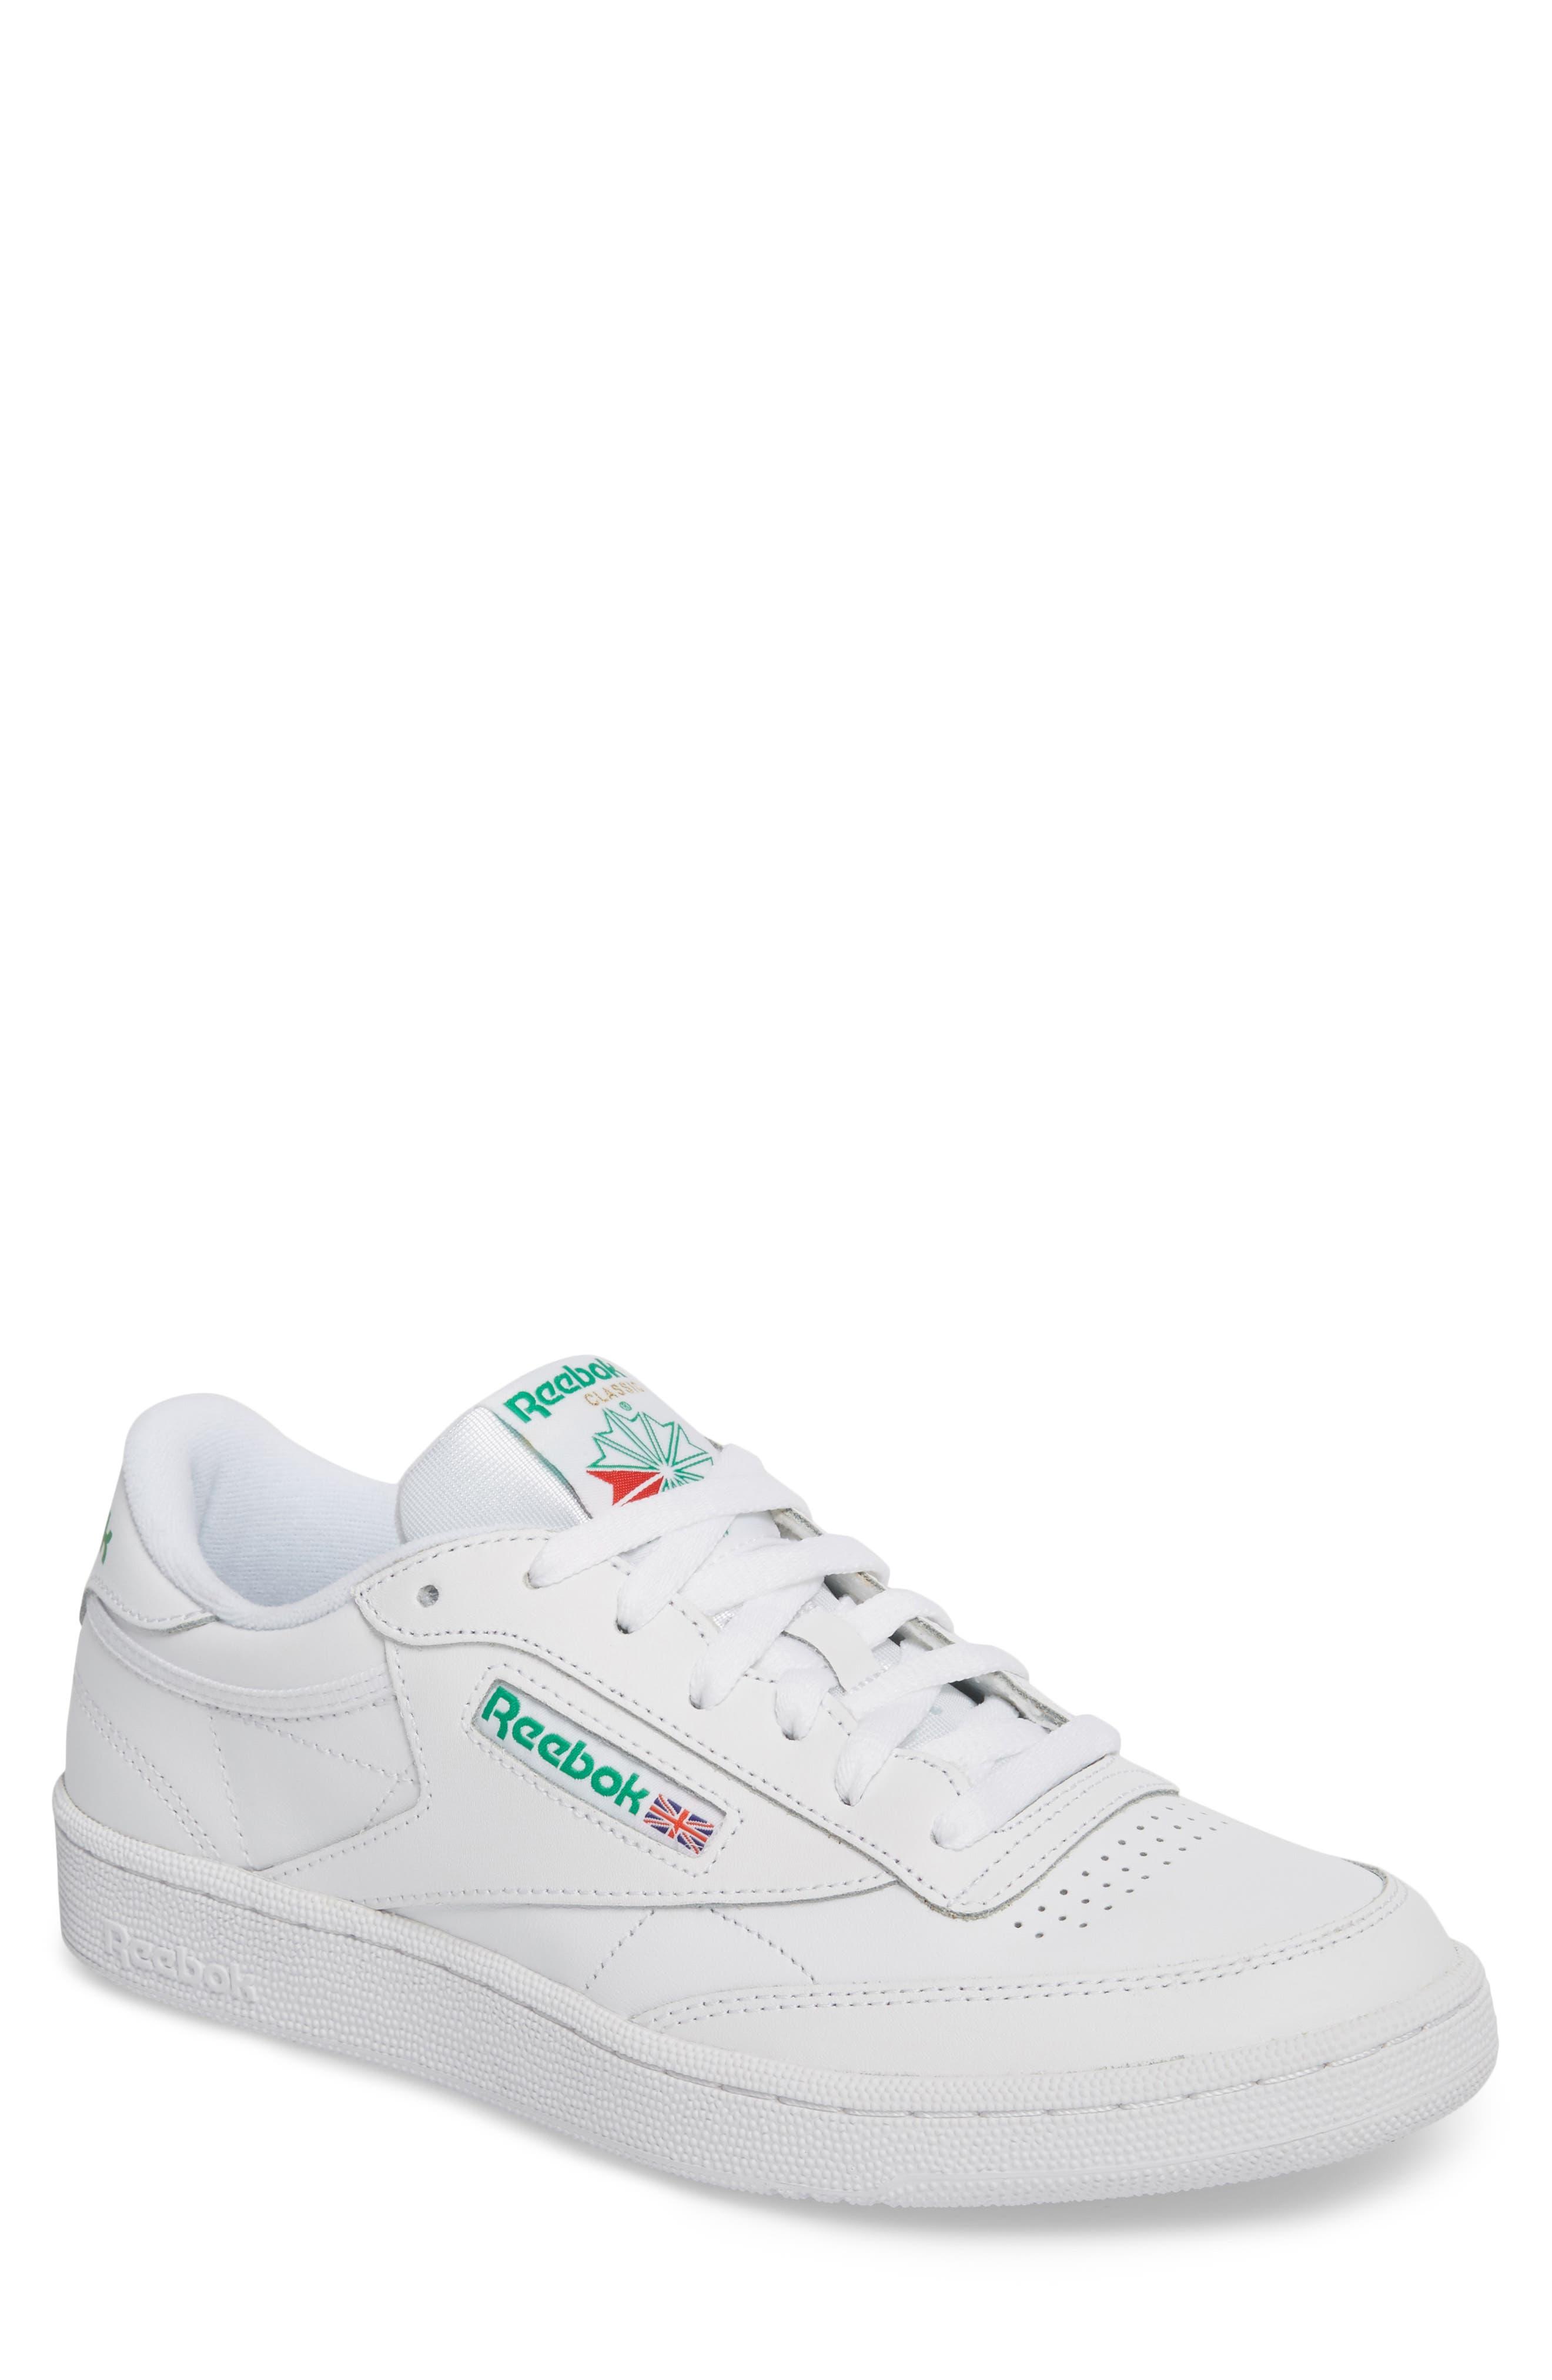 Club C 85 Sneaker,                             Main thumbnail 1, color,                             White